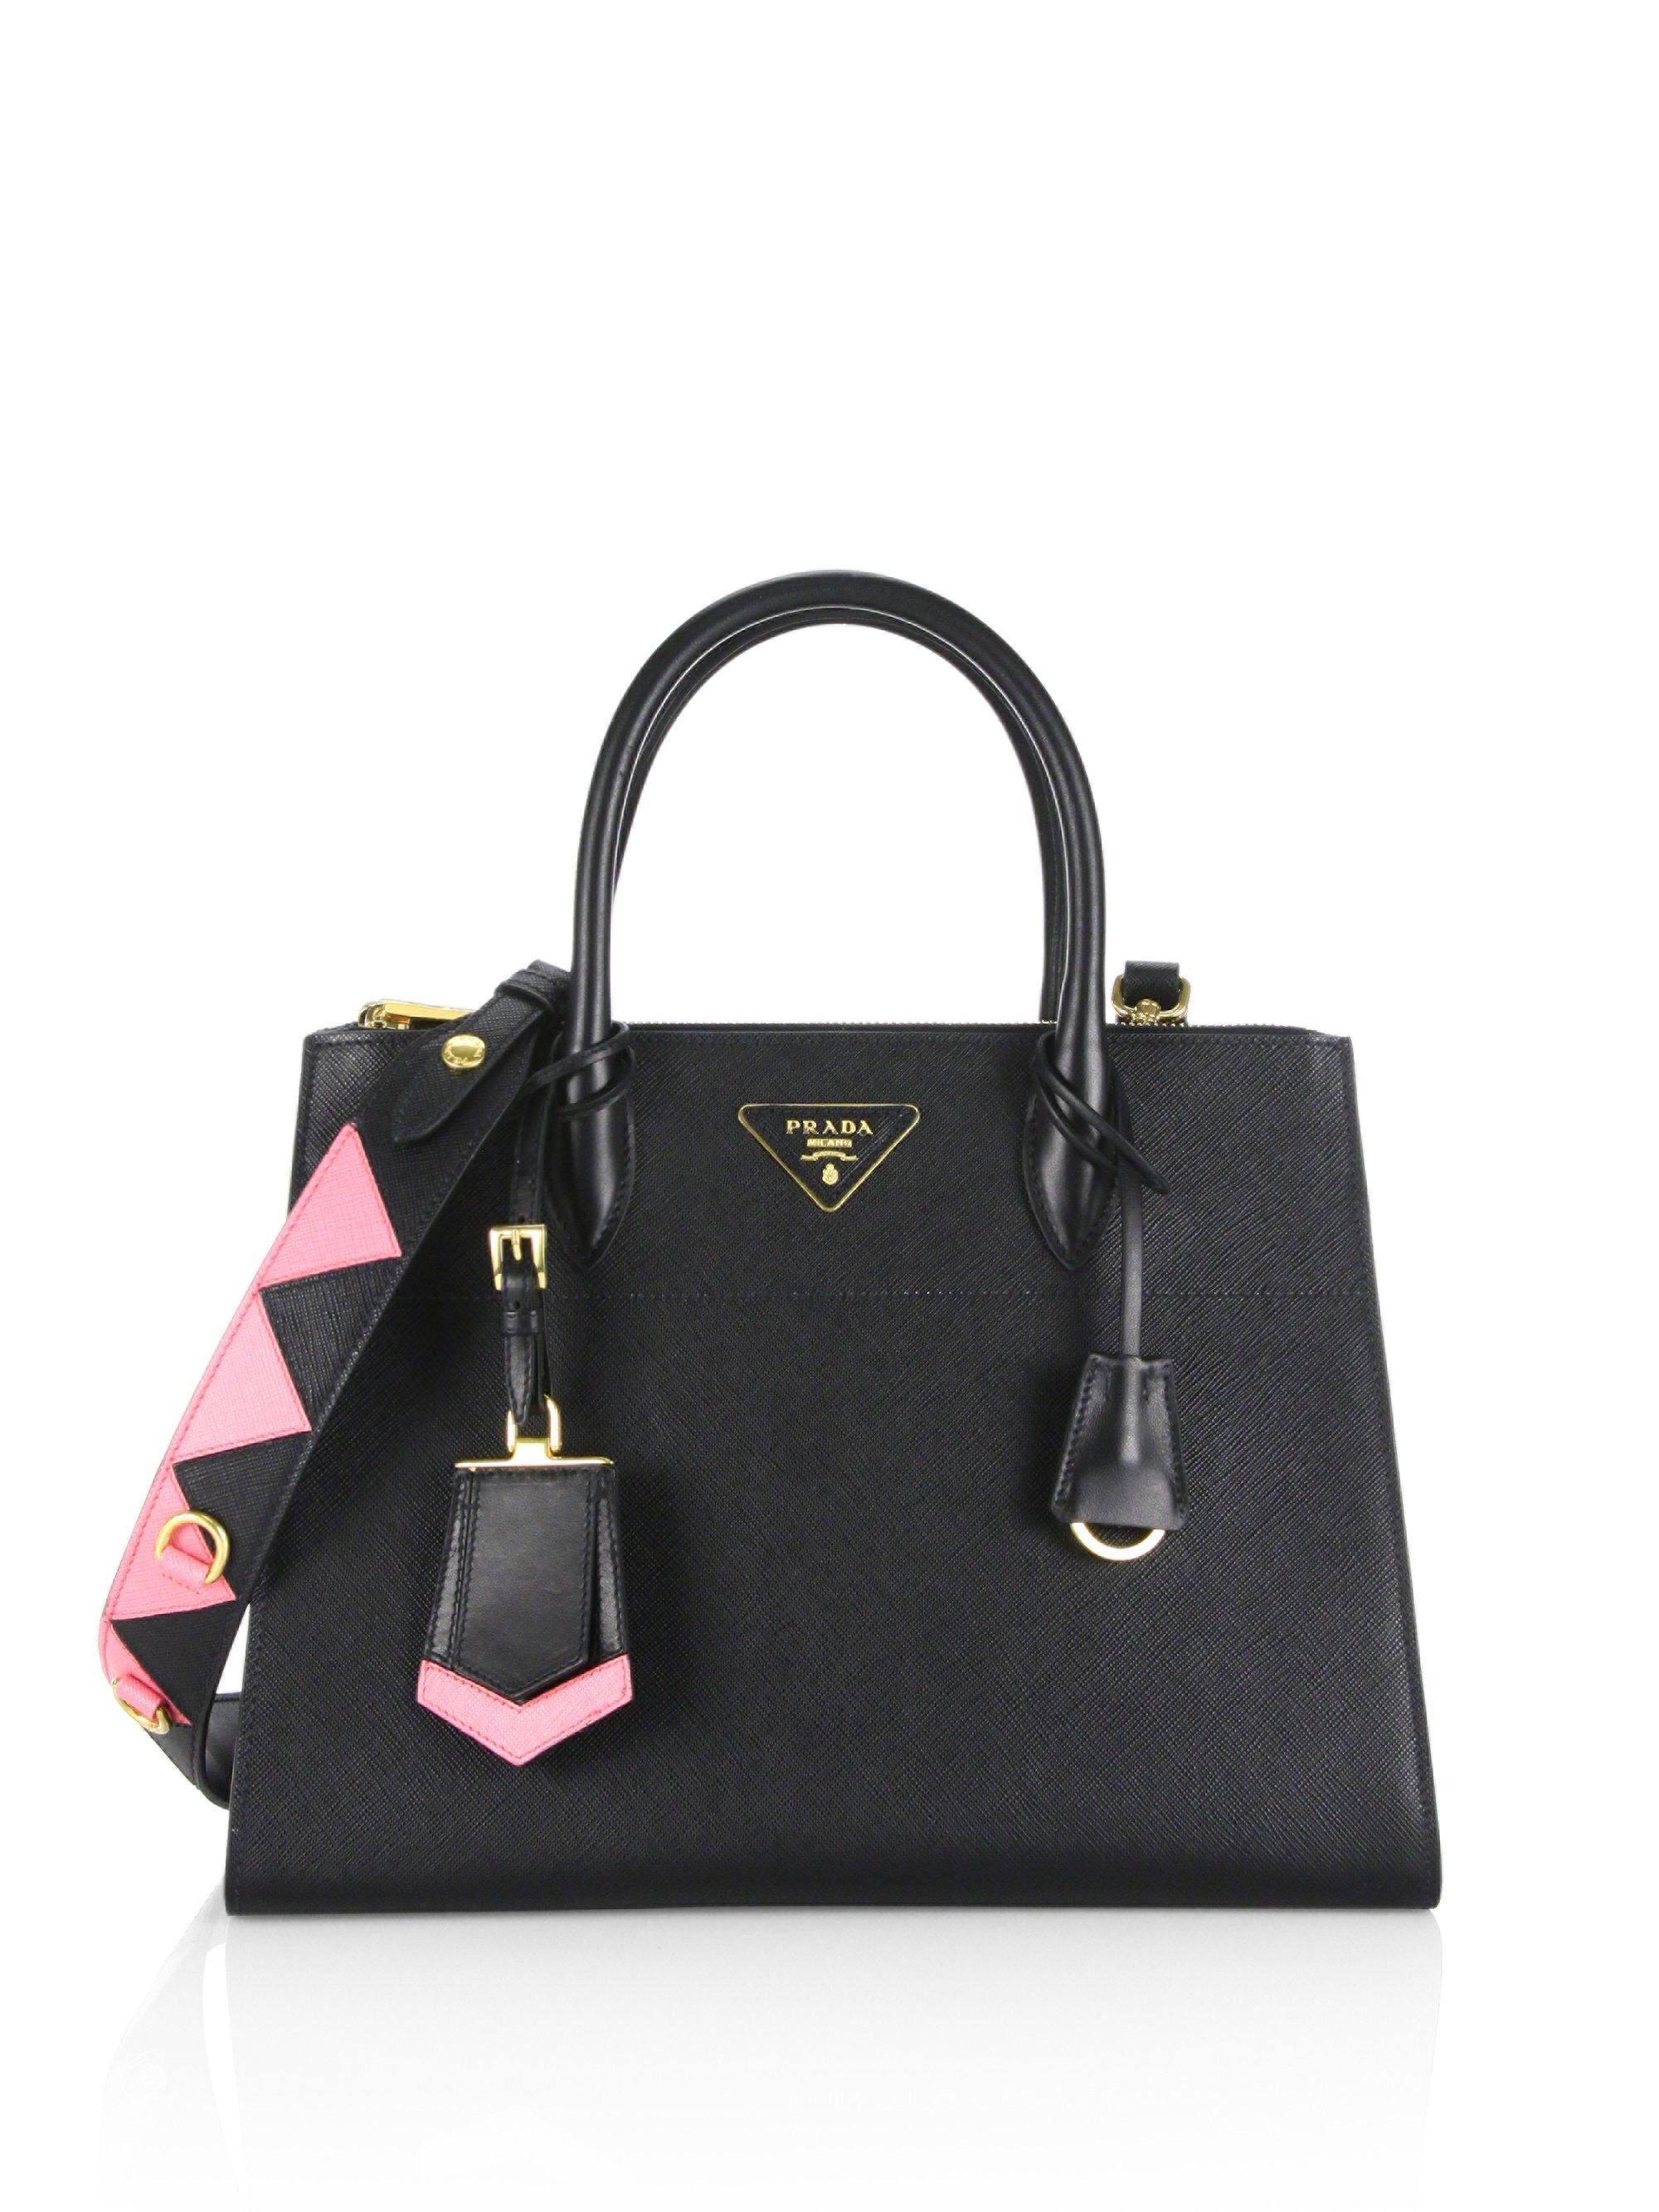 c384cd2cd03d Prada Paradigme Saffiano Leather Tote in Black - Lyst